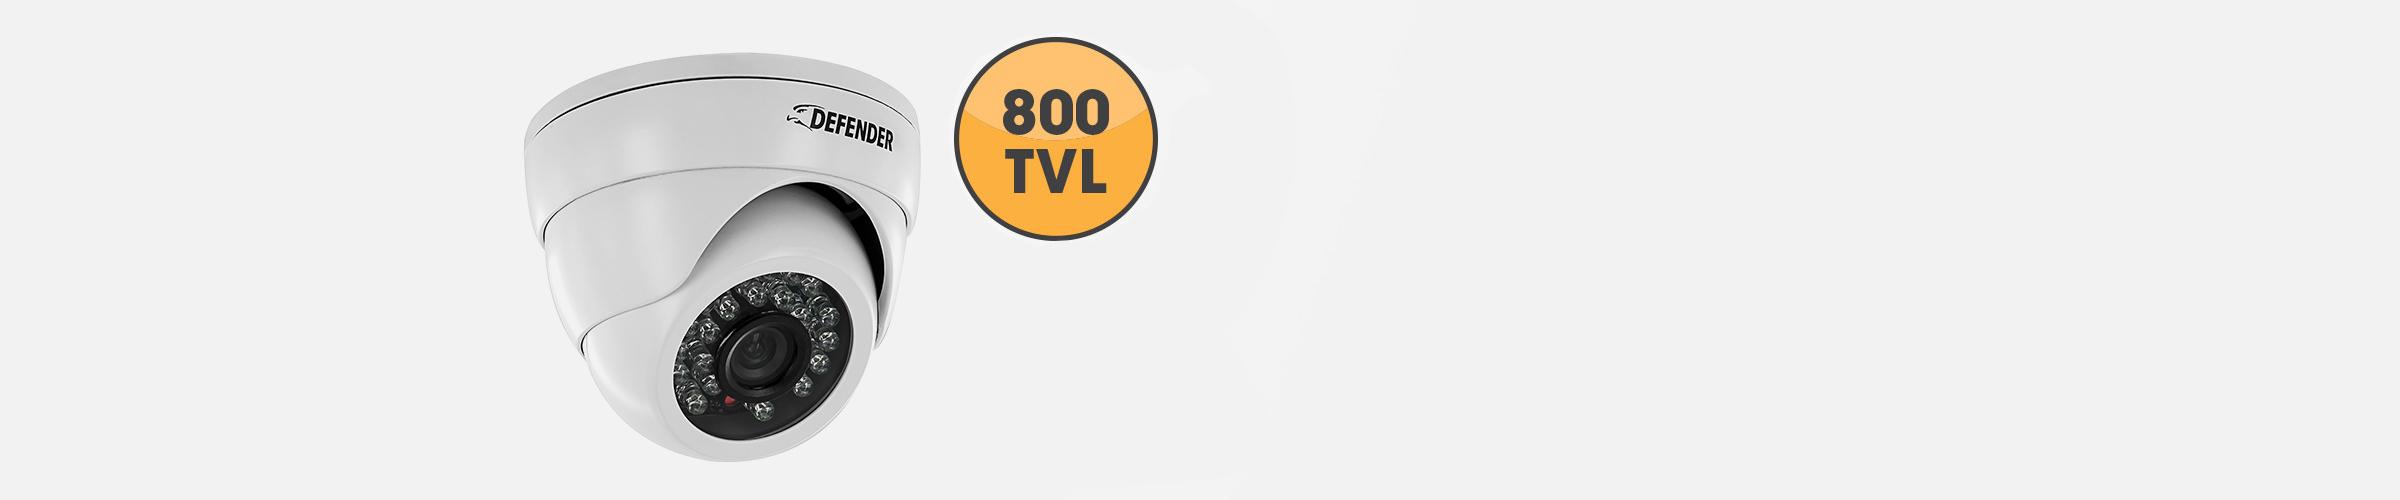 800tvl security cameras included